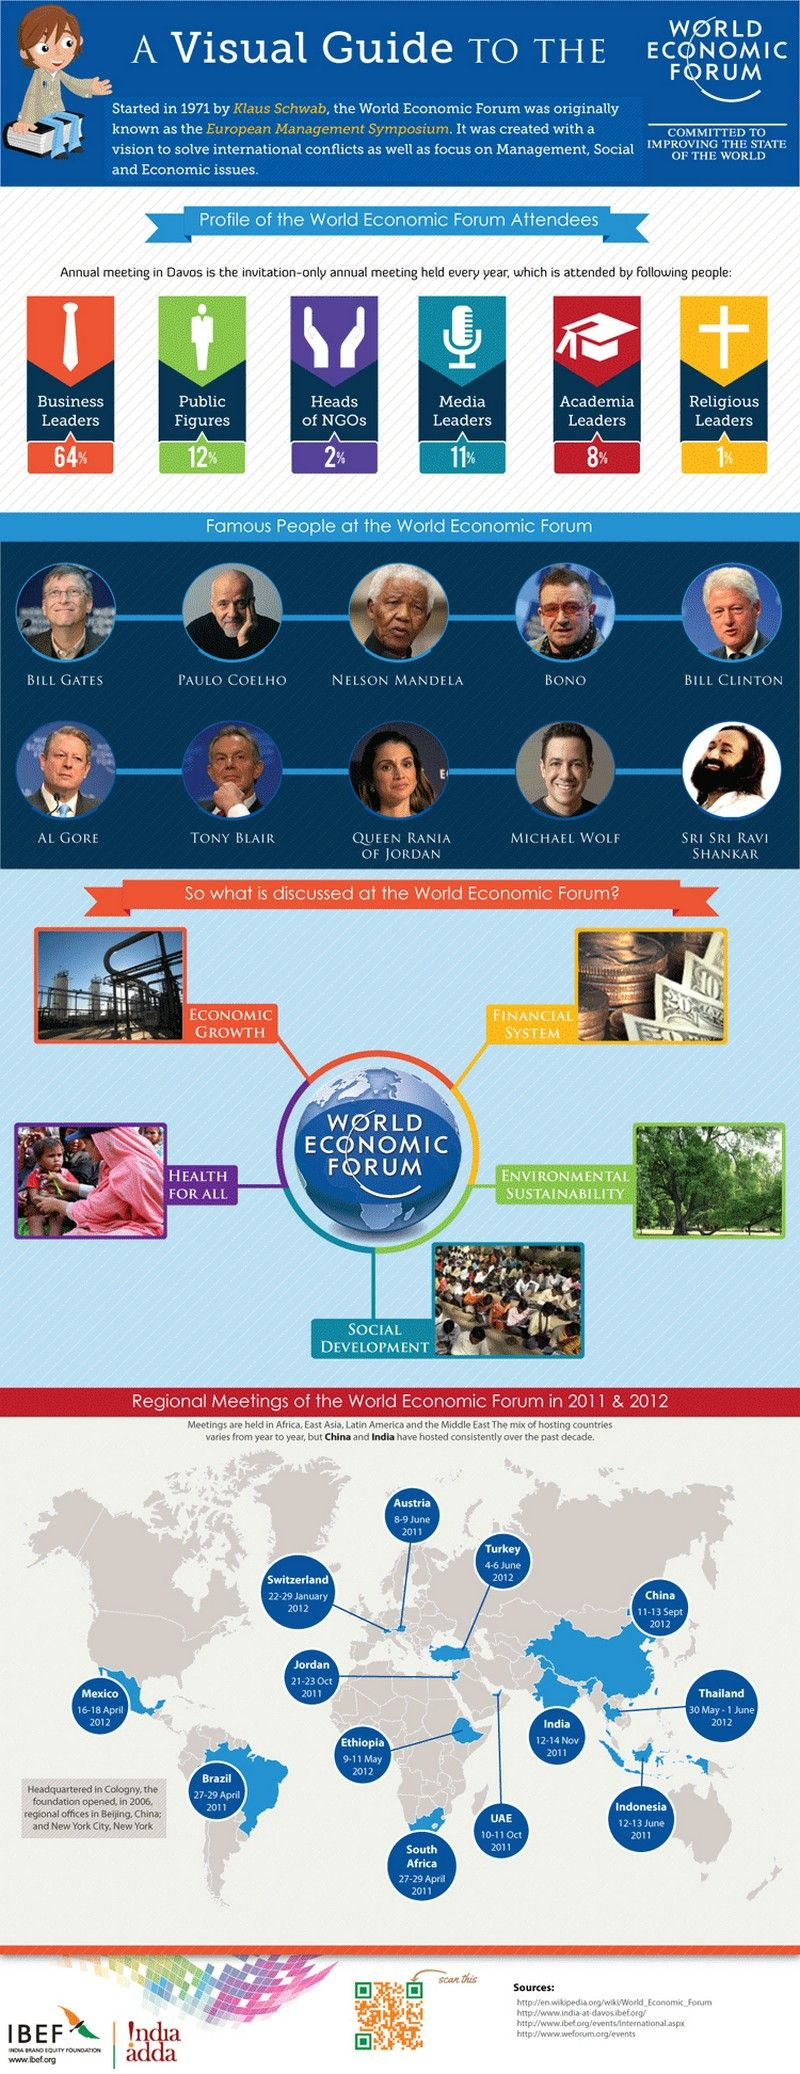 9bfad150775c96c972d66fdf9ed113f3 - How To Get Invited To The World Economic Forum